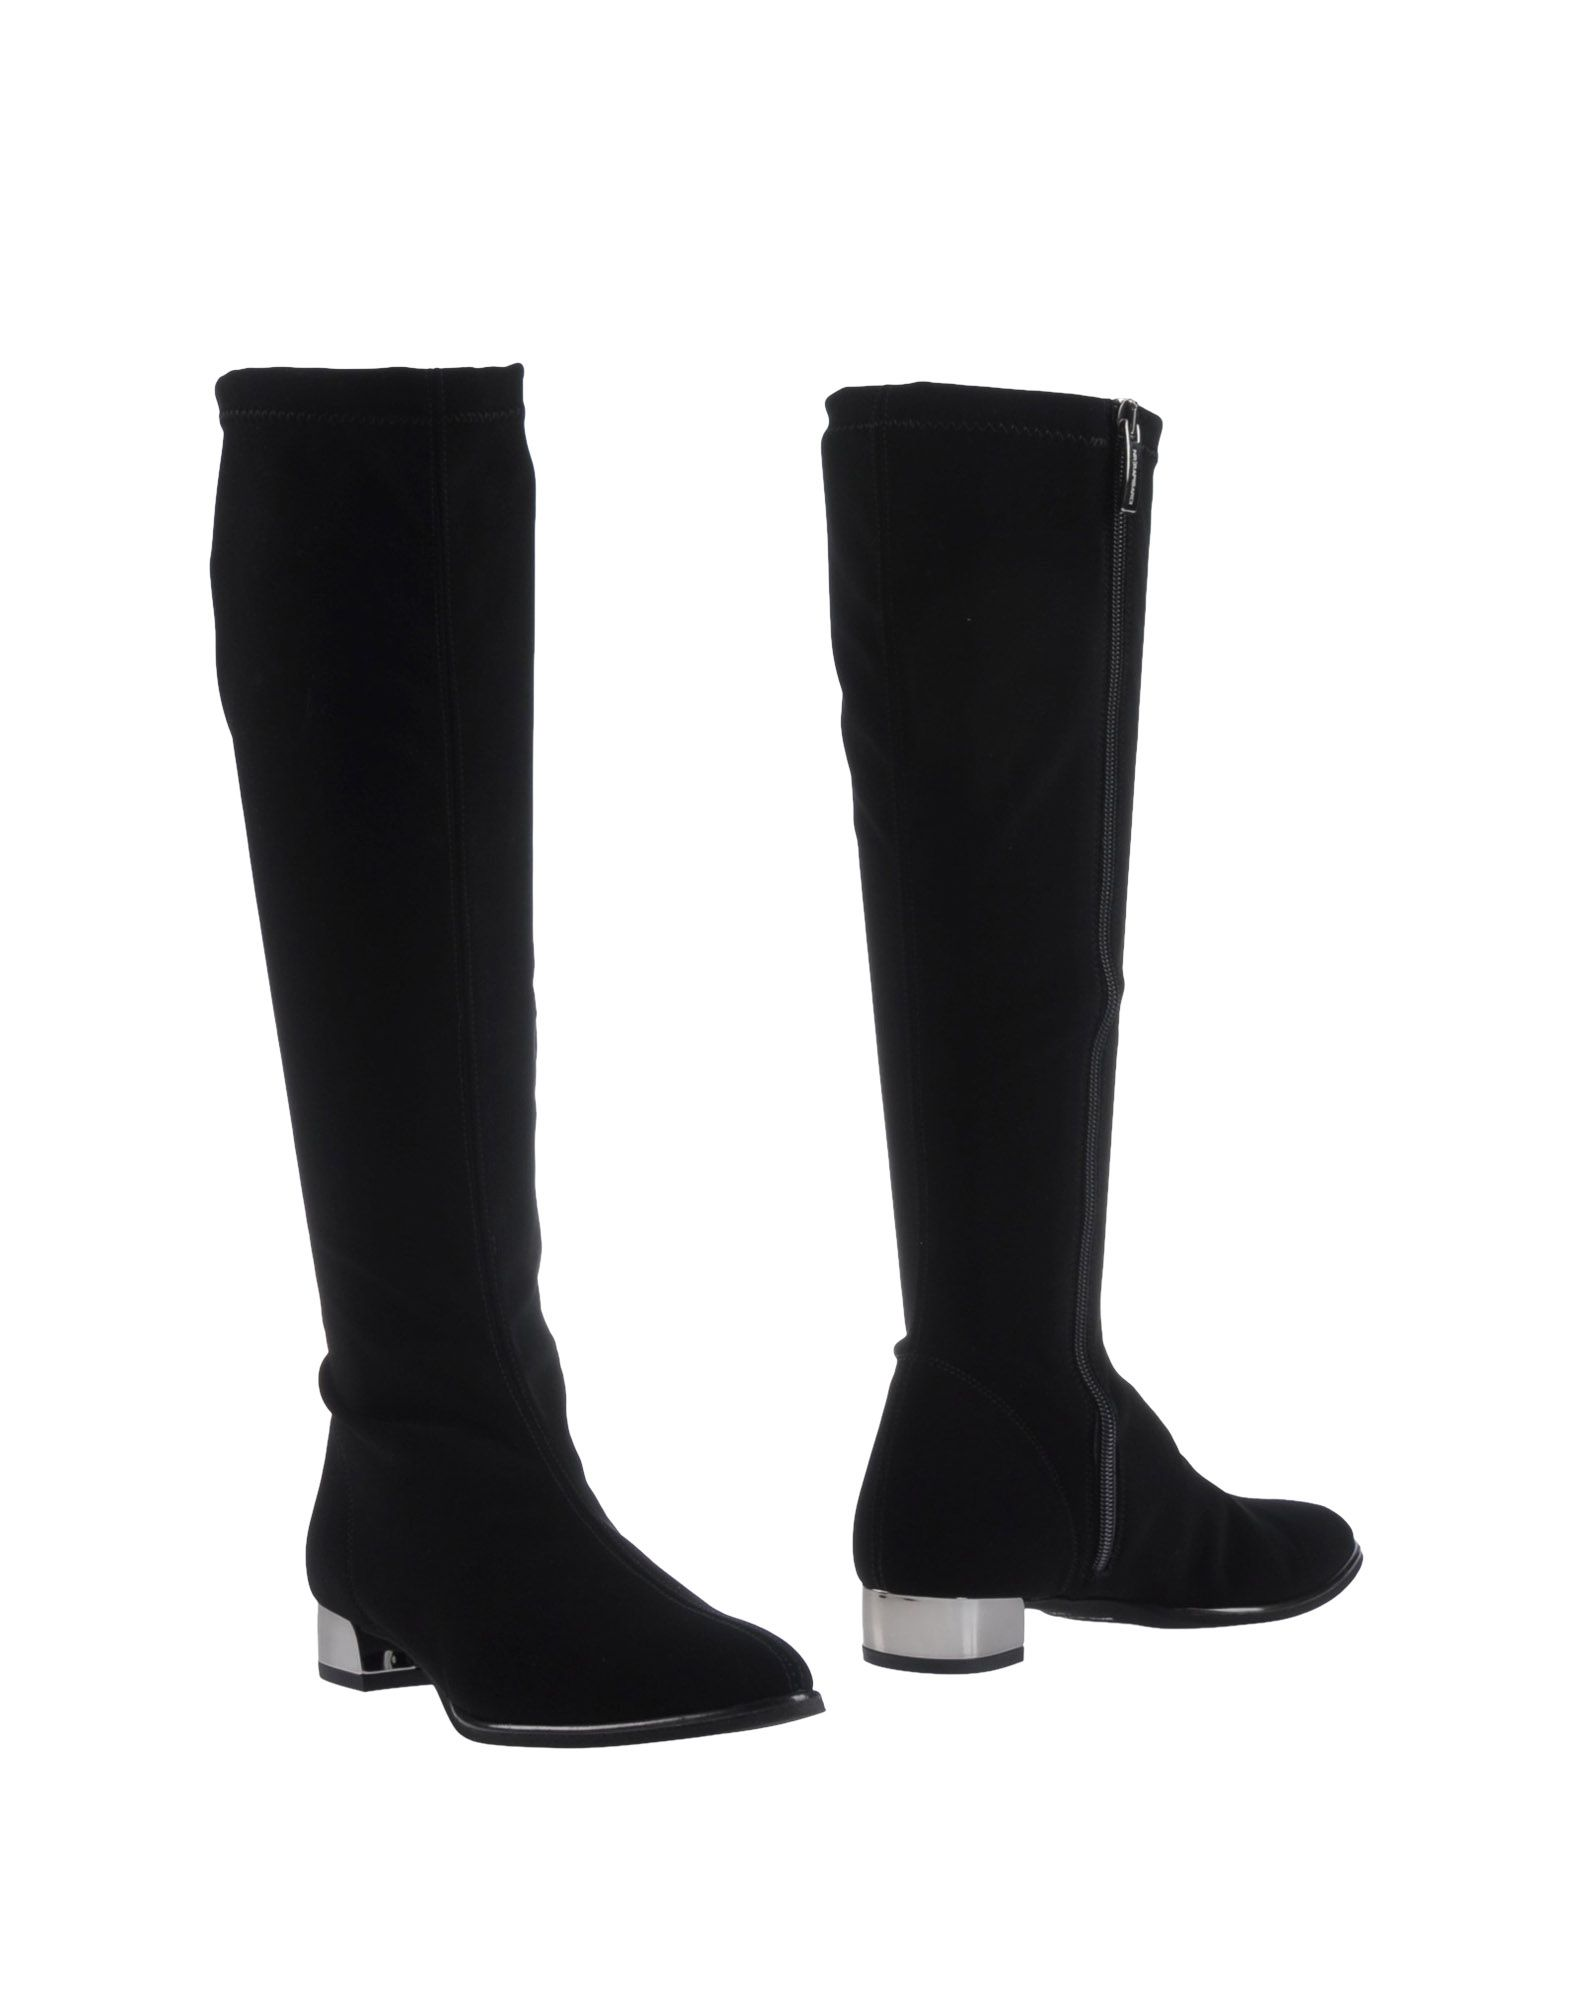 Nr Nr Rapisardi Boots - Women Nr Nr Rapisardi Boots online on  United Kingdom - 11048507GJ 265dff